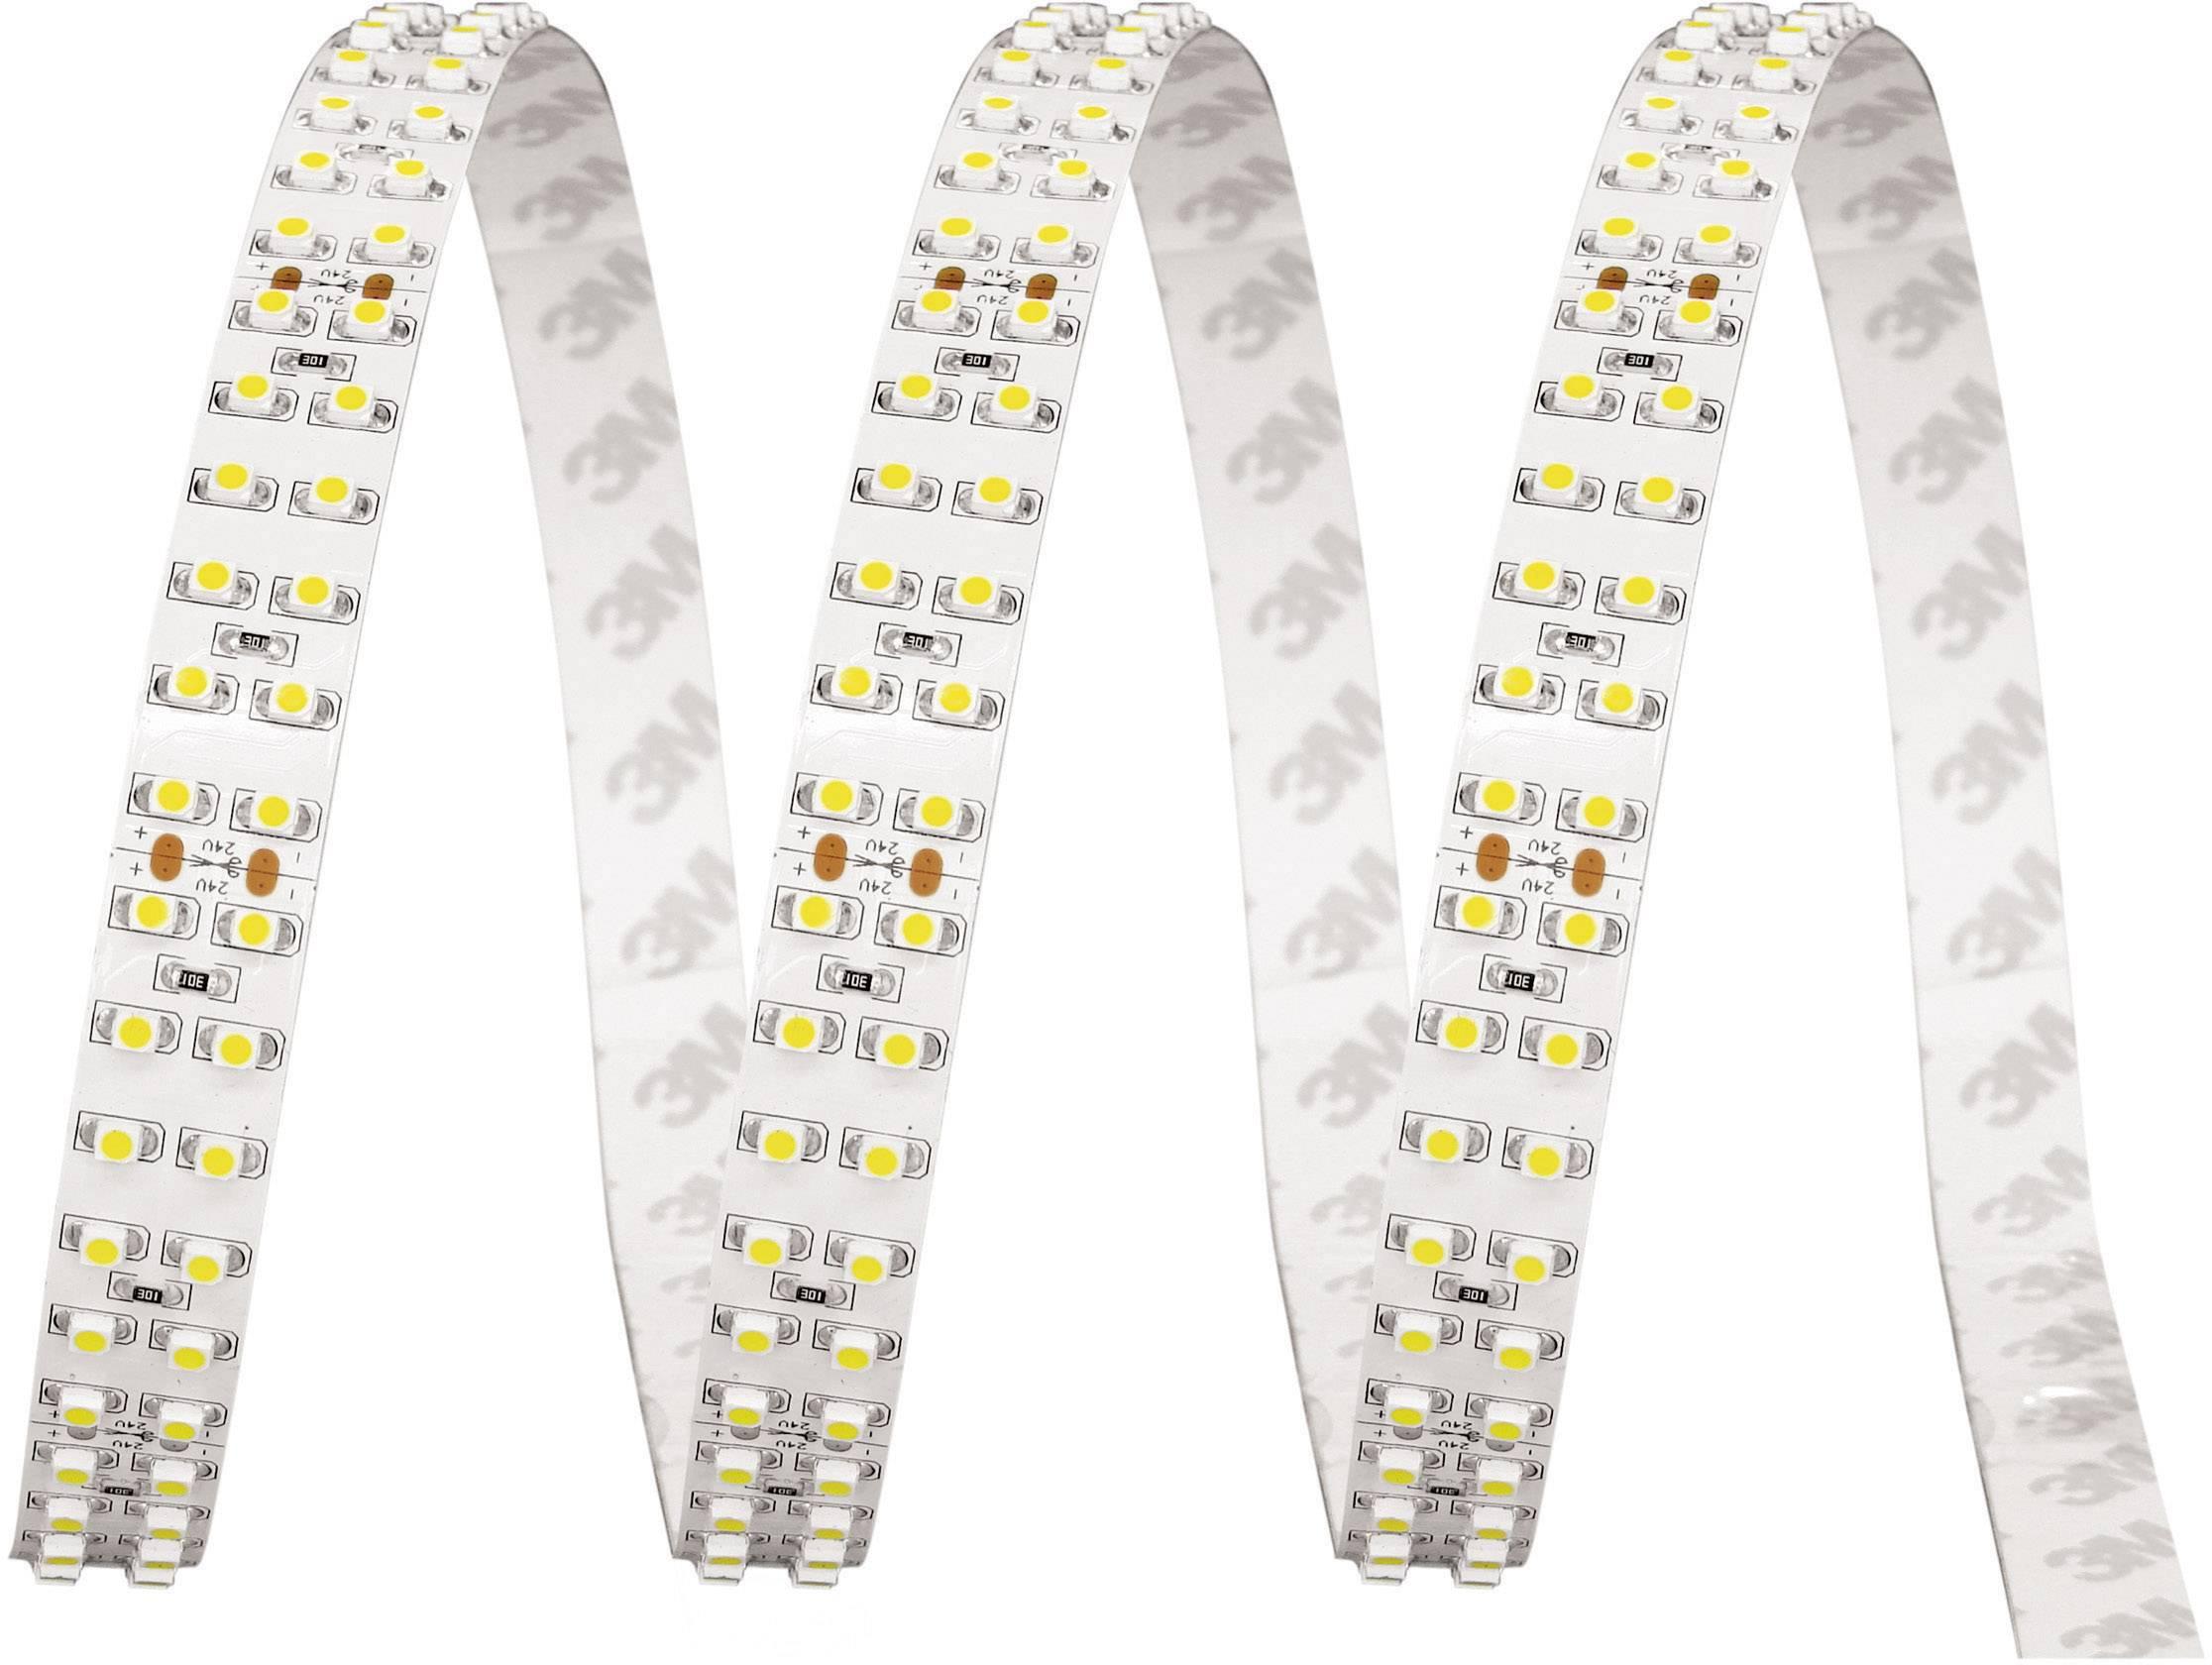 LED pás ohebný samolepicí 24VDC ledxon High Power Double SMD BAND, 9009046, 50 mm, chladná bílá